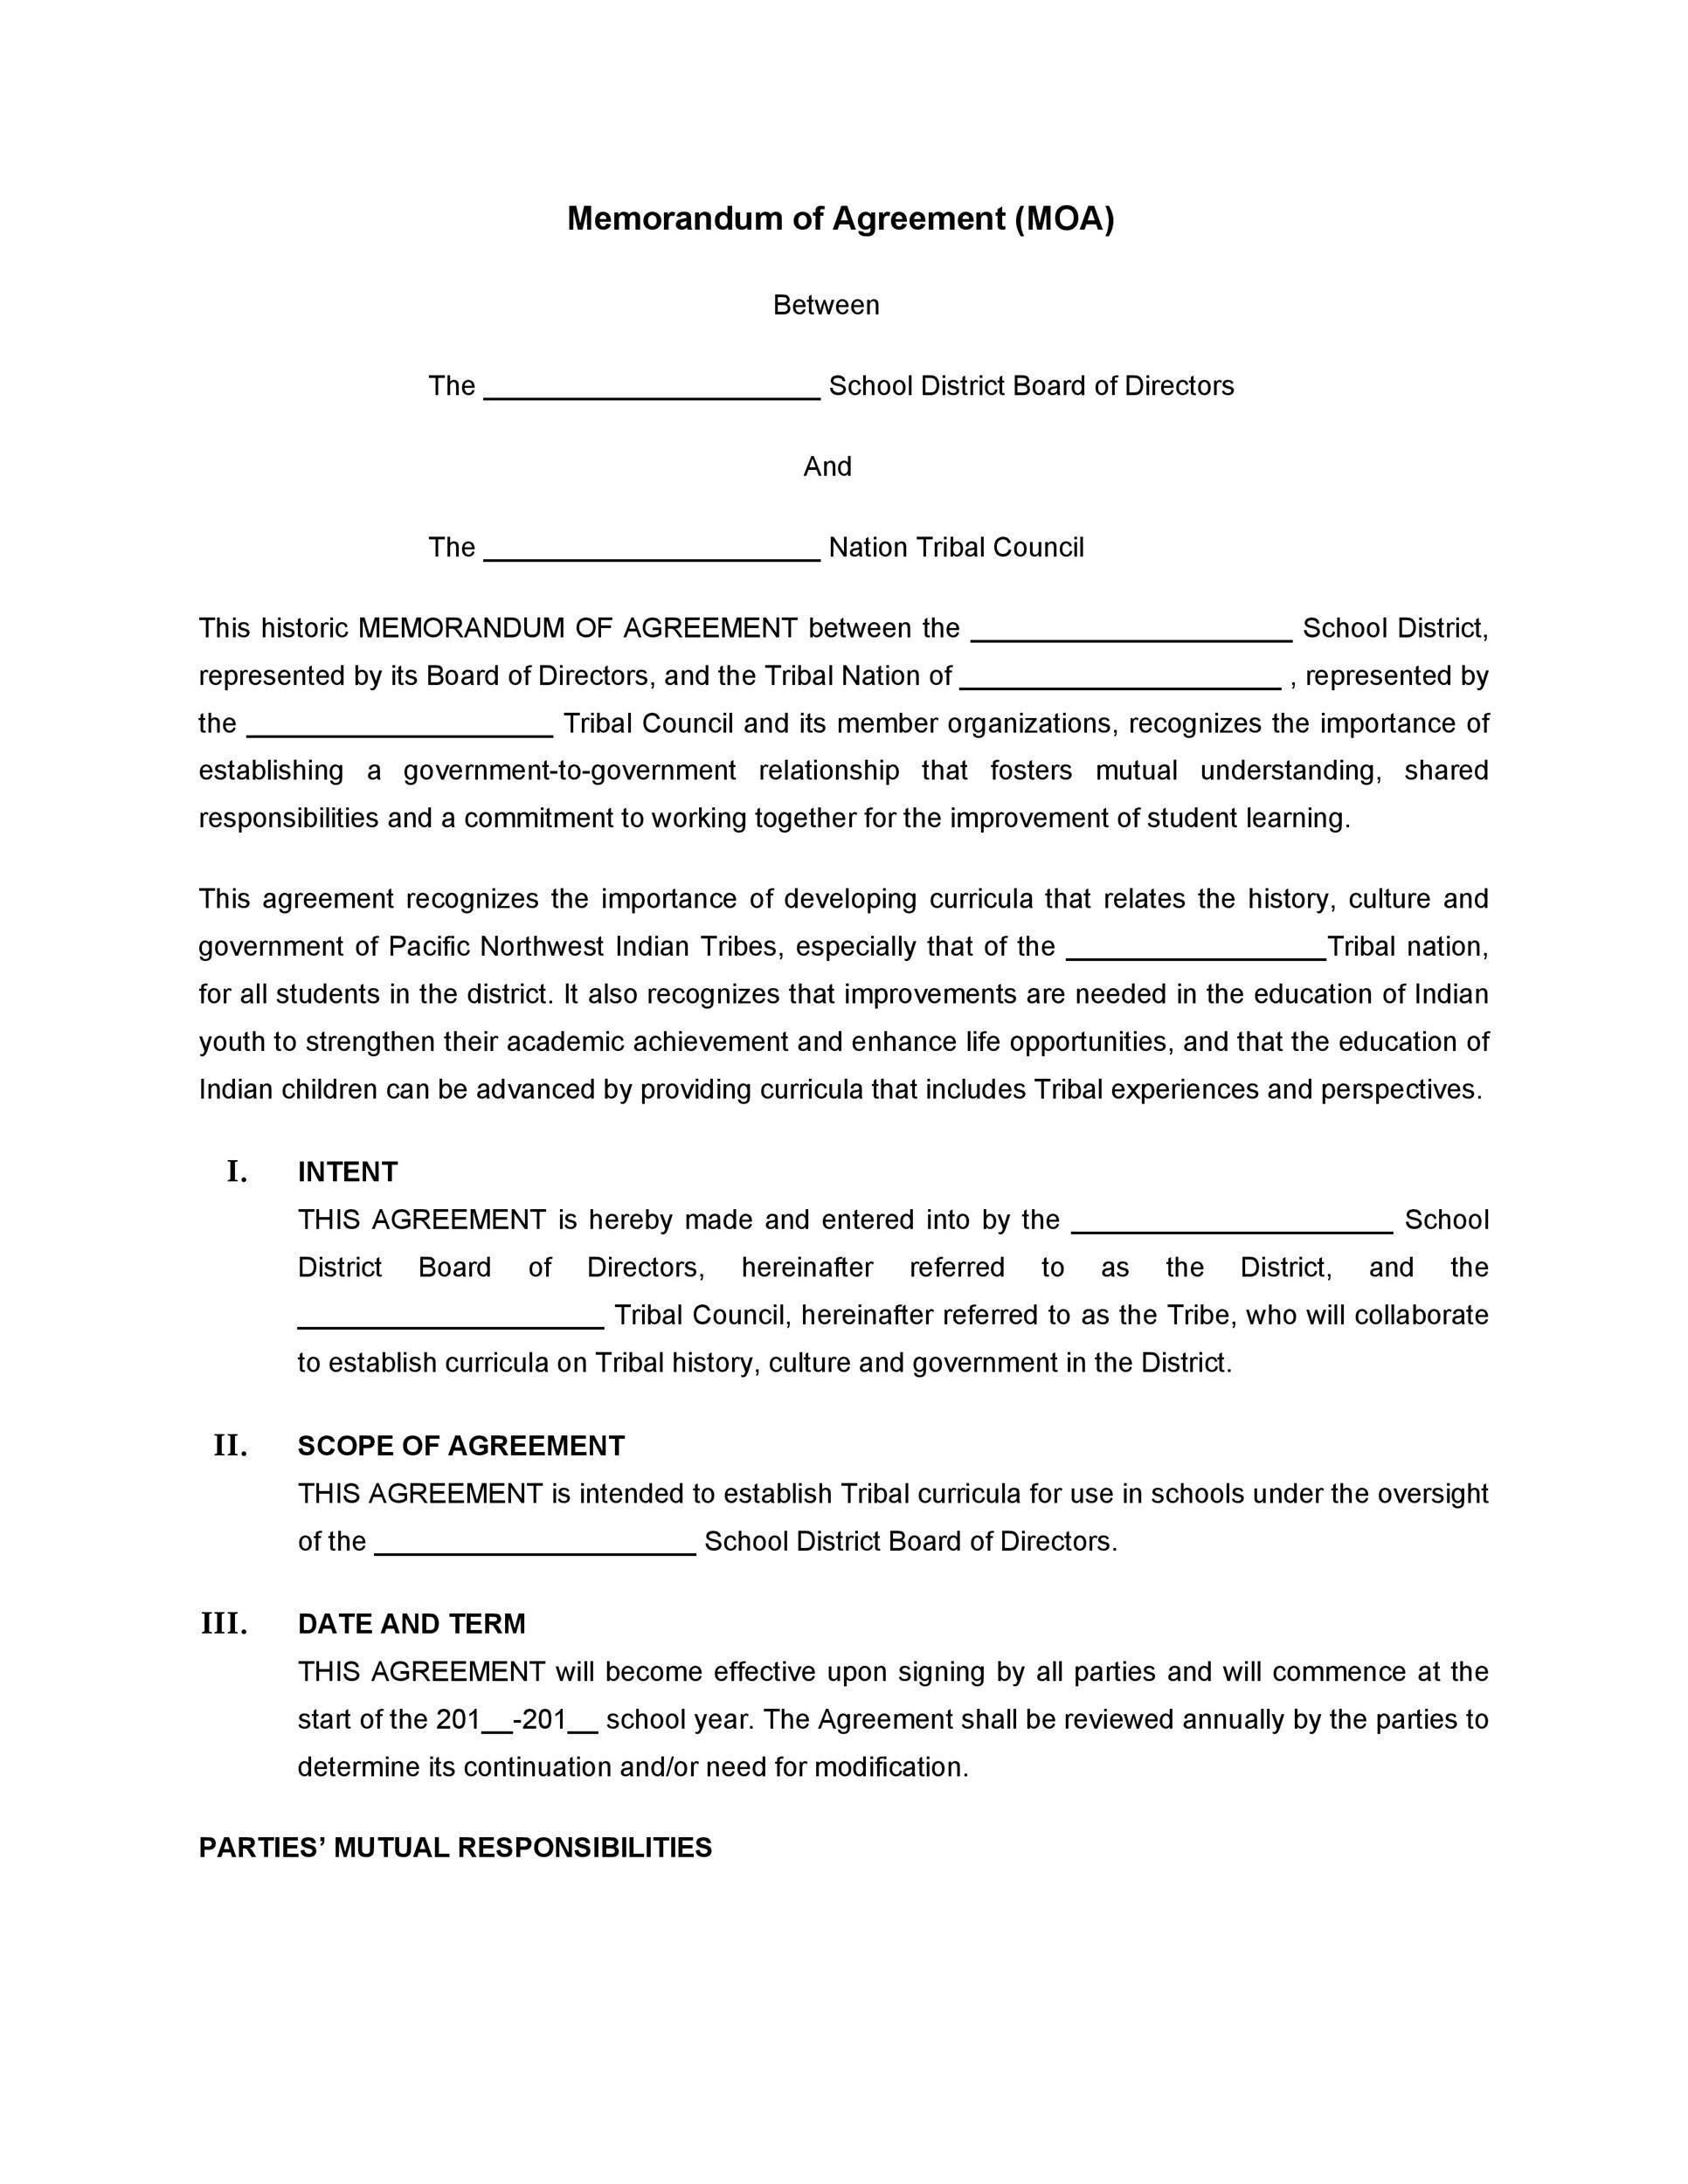 000 Phenomenal Private Placement Memorandum Outline High Resolution  Template Offering Sample FilmFull